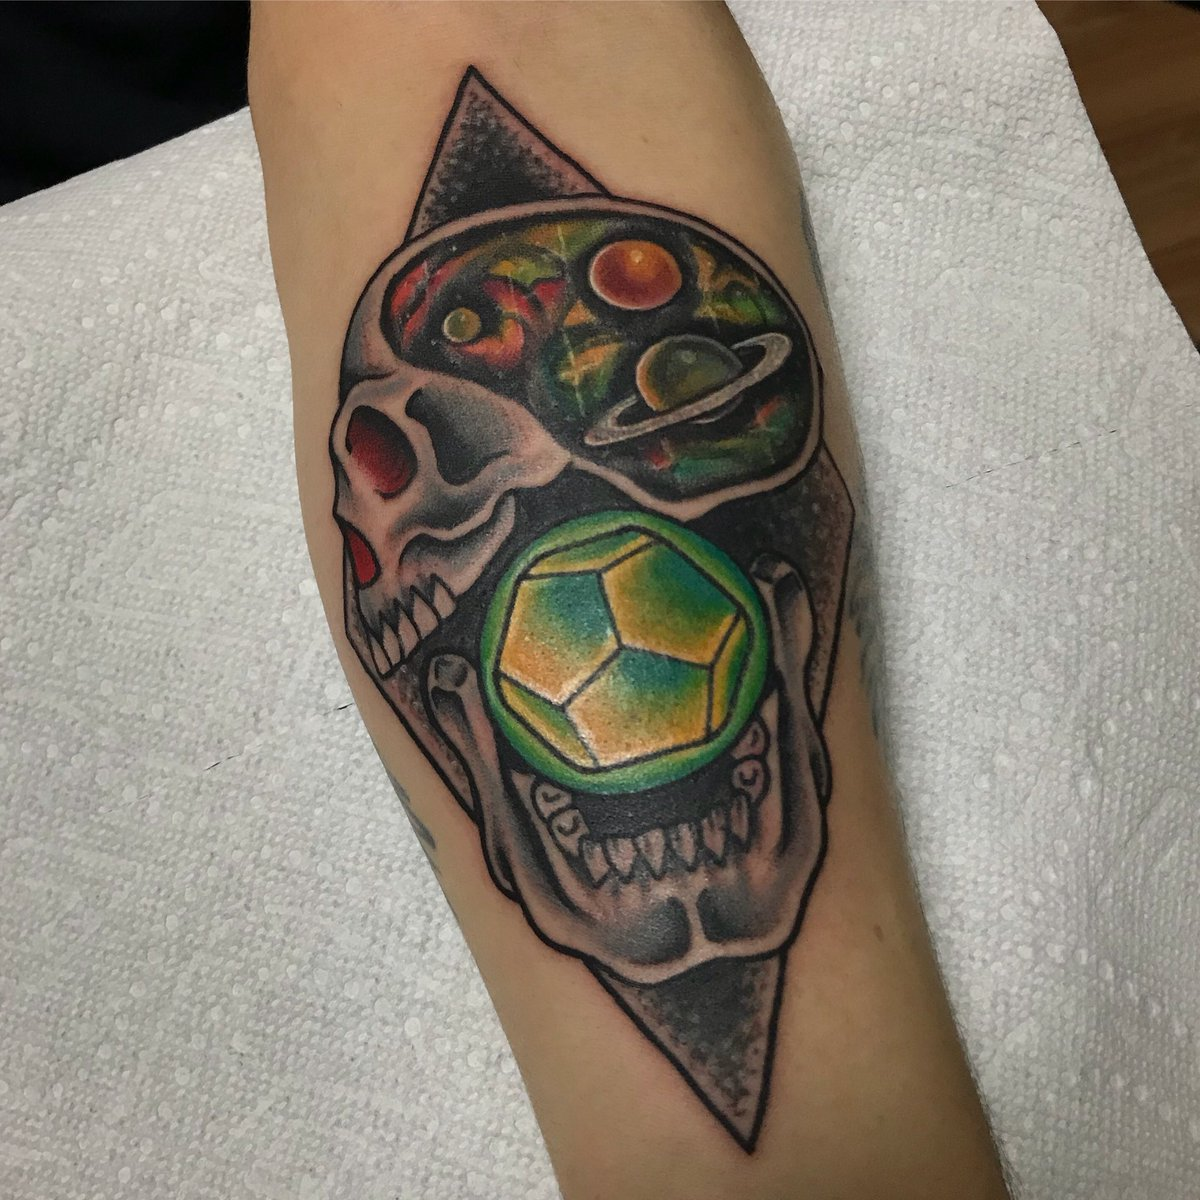 Chaney Tattoo